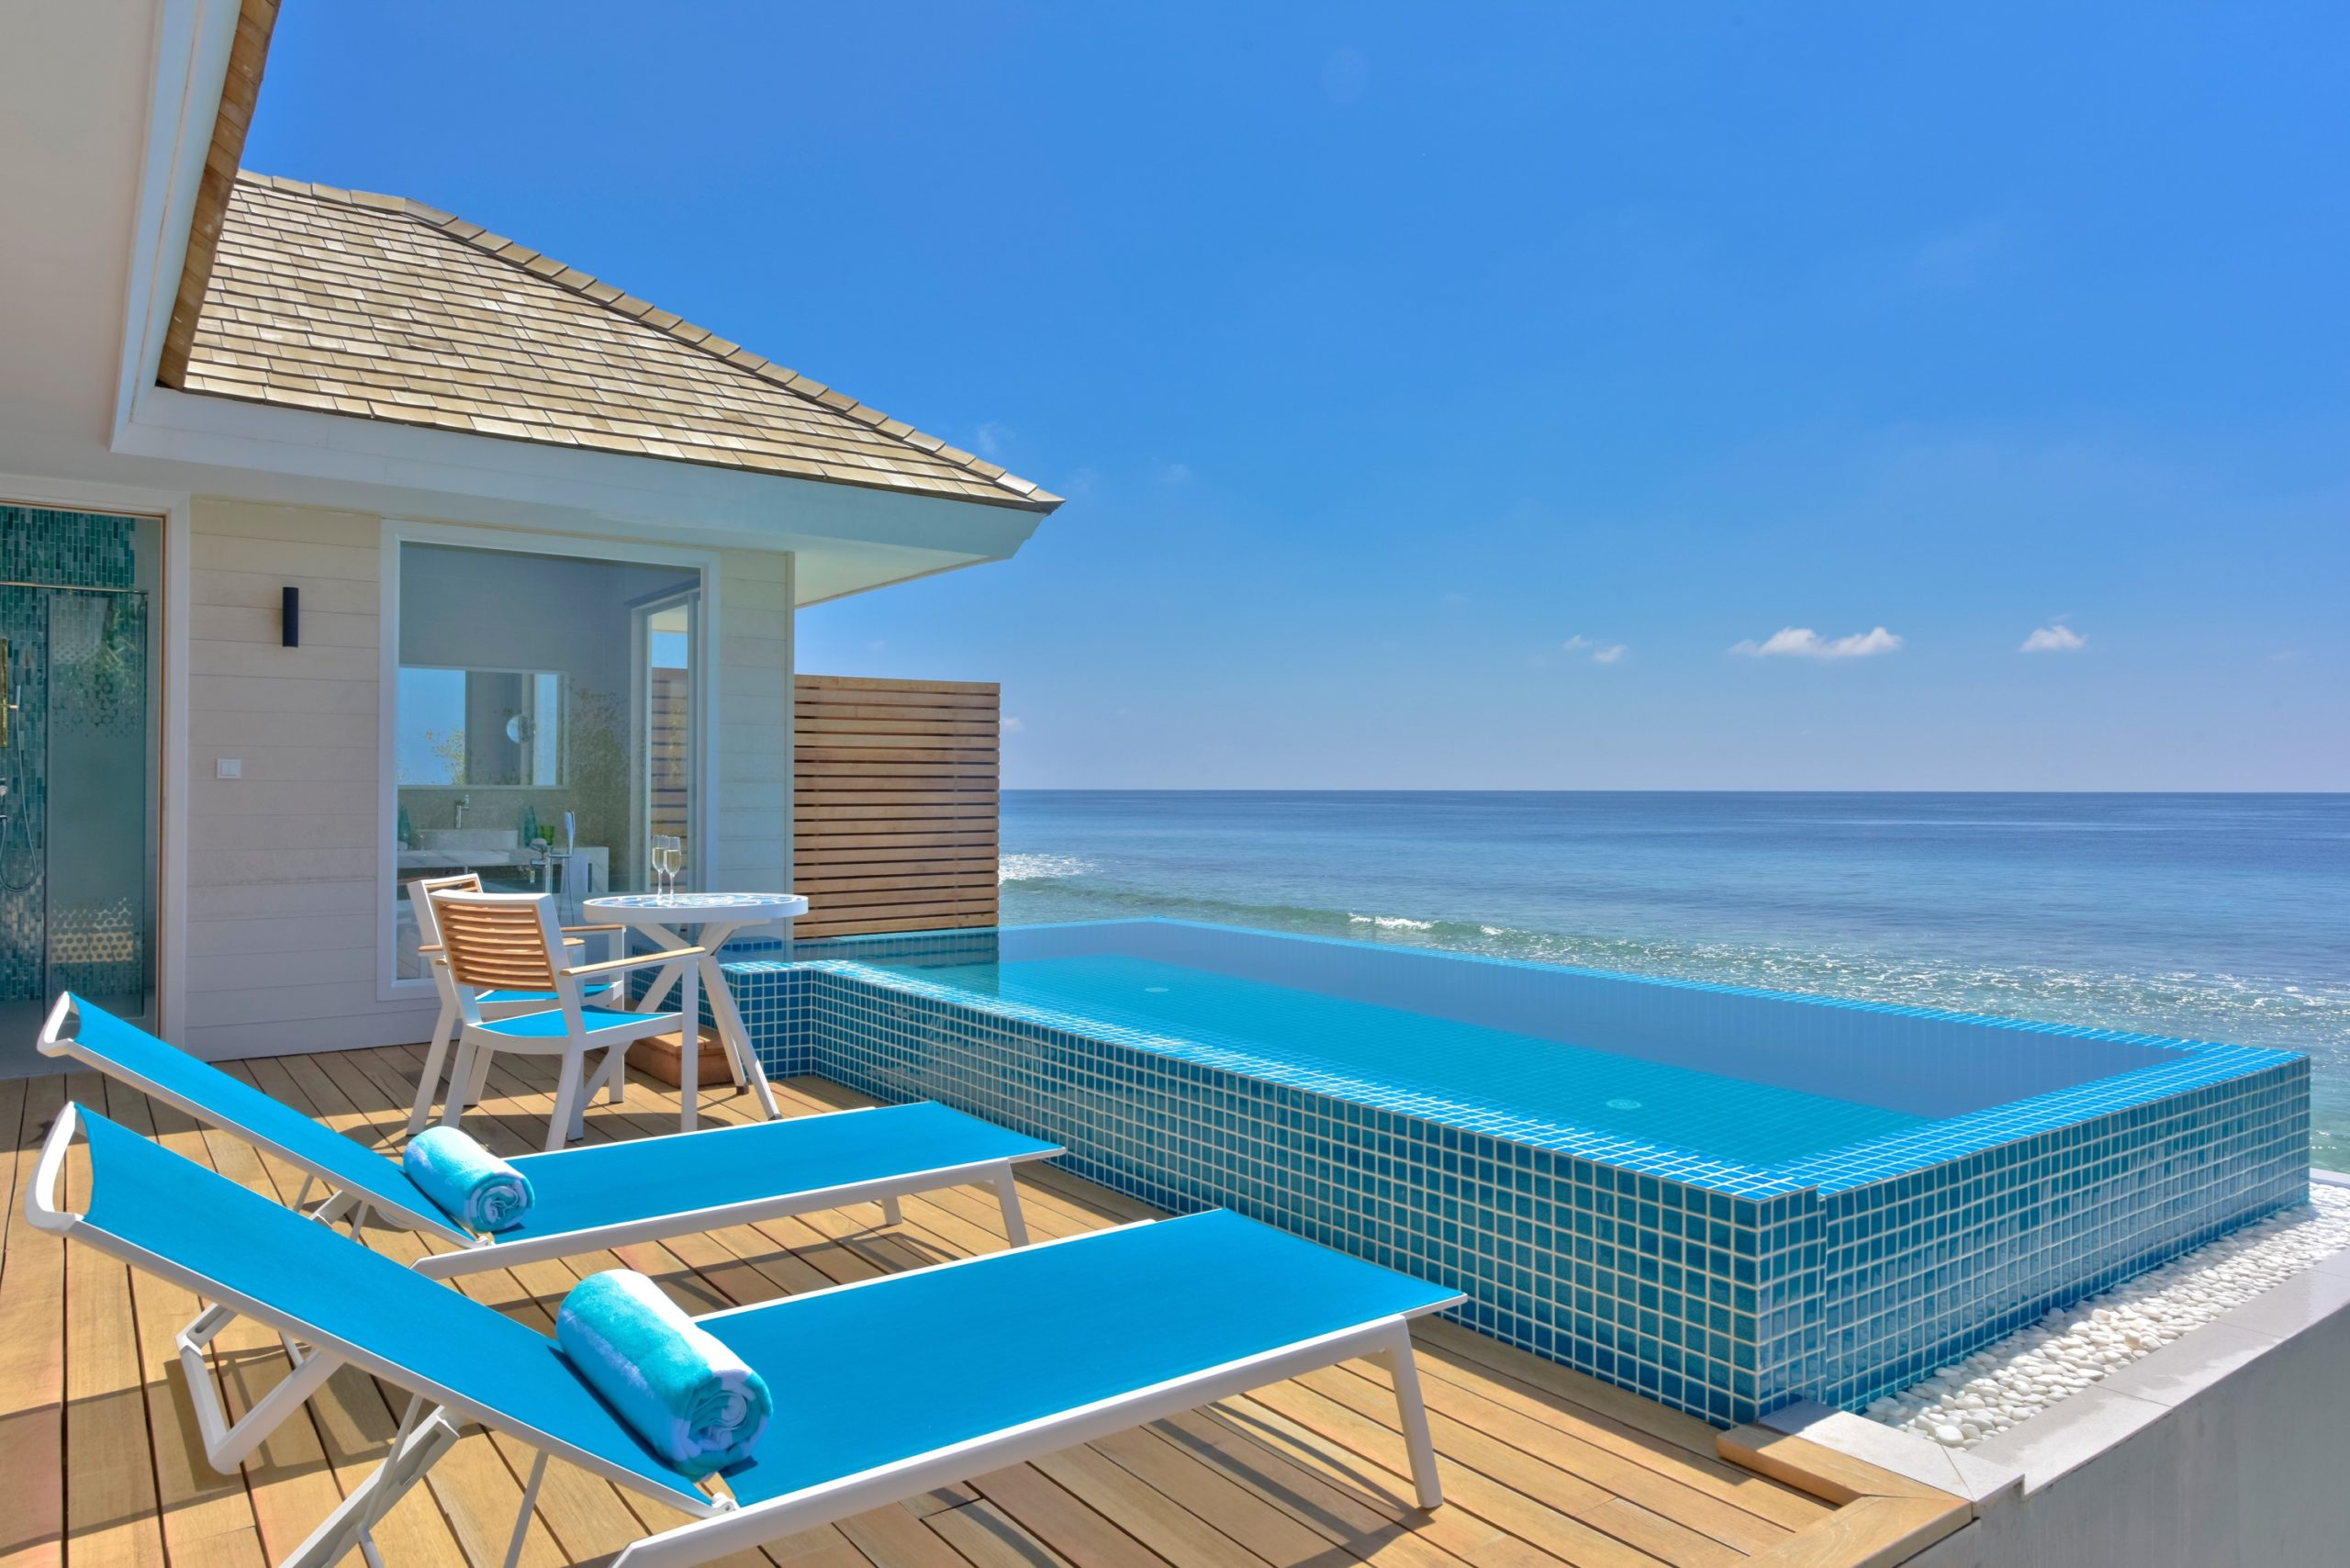 Ocean Pool Villa